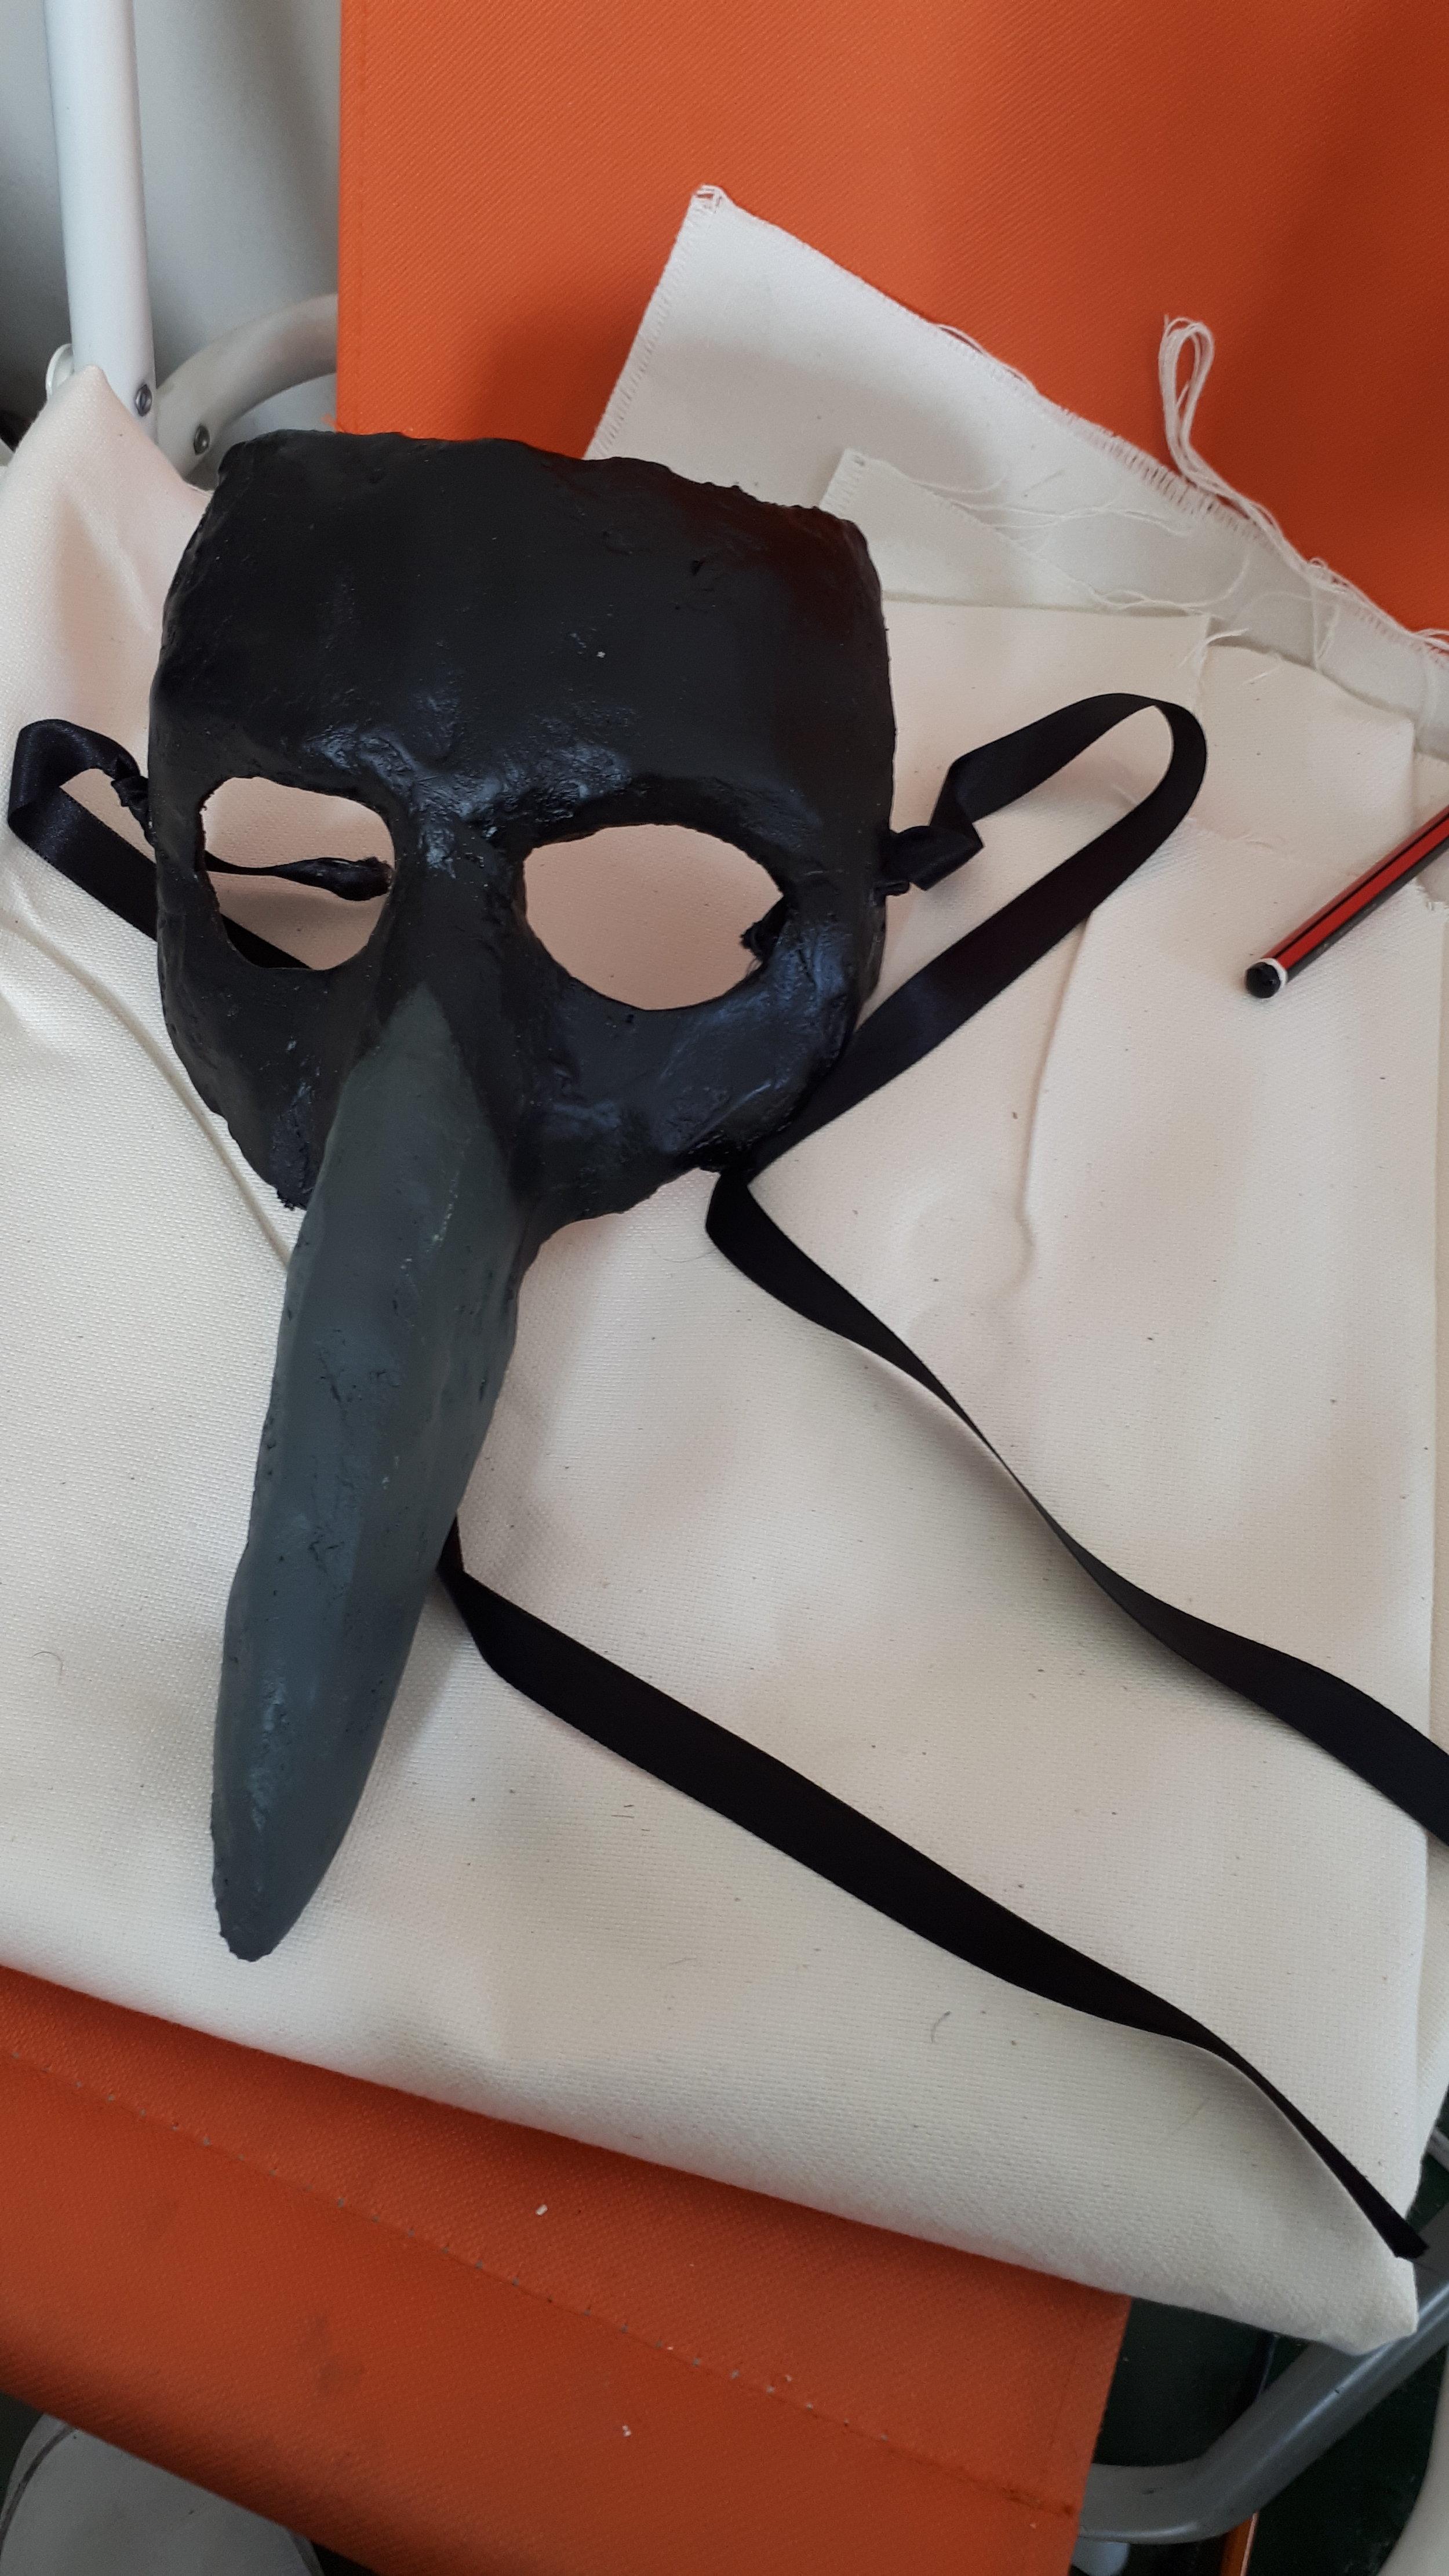 The Sluagh mask made from plaster bandage